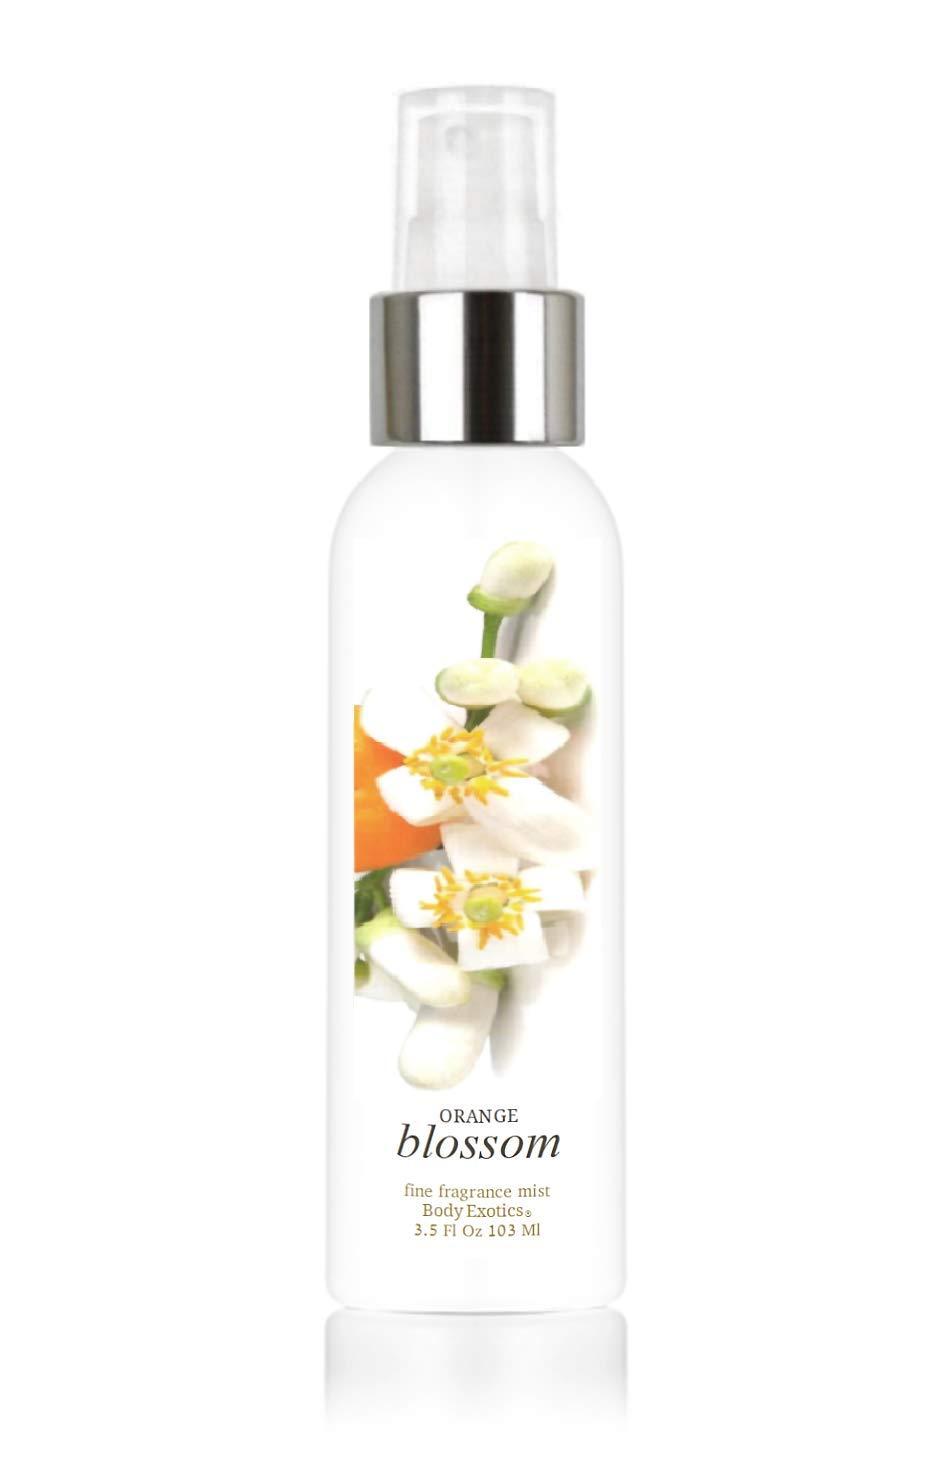 "Orange Blossom with Neroli Perfume Voted""Most Realistic"" Fine Fragrance Cologne Mist Body Exotics 3.5 Fl Oz 103 Ml a Lush Heady True Orange Blossom Floral with Neroli Essential Oil"